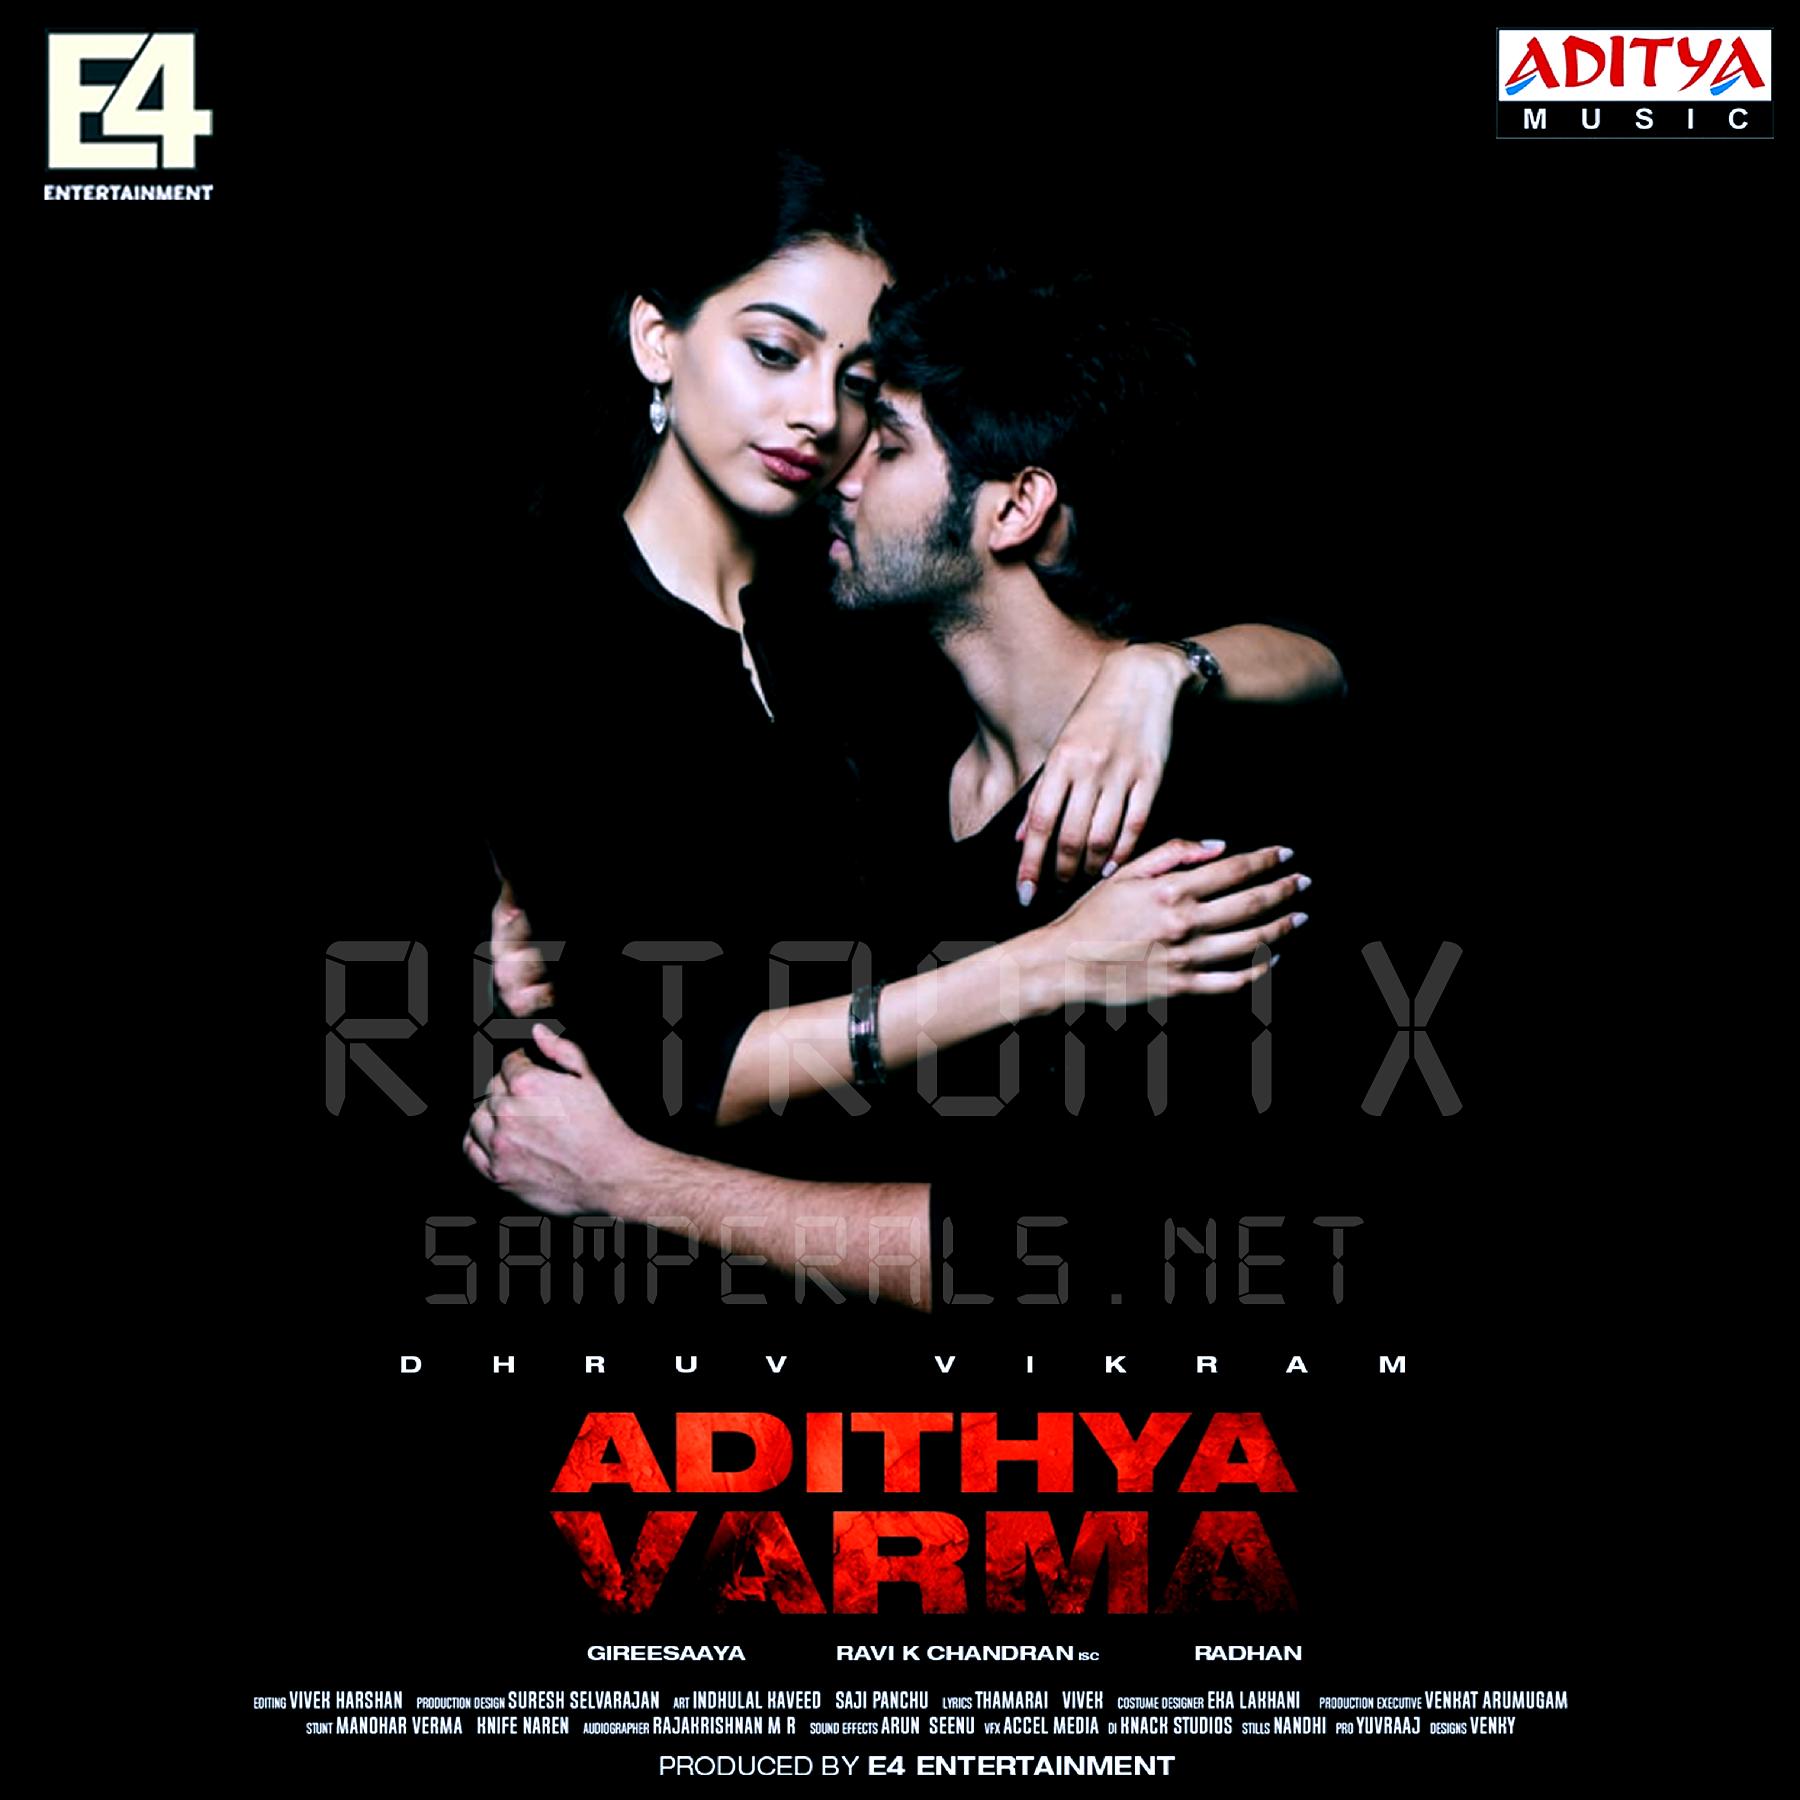 Adithya Varma 2019 Digitalrip Wav Best Love Pics Music Hd Photos